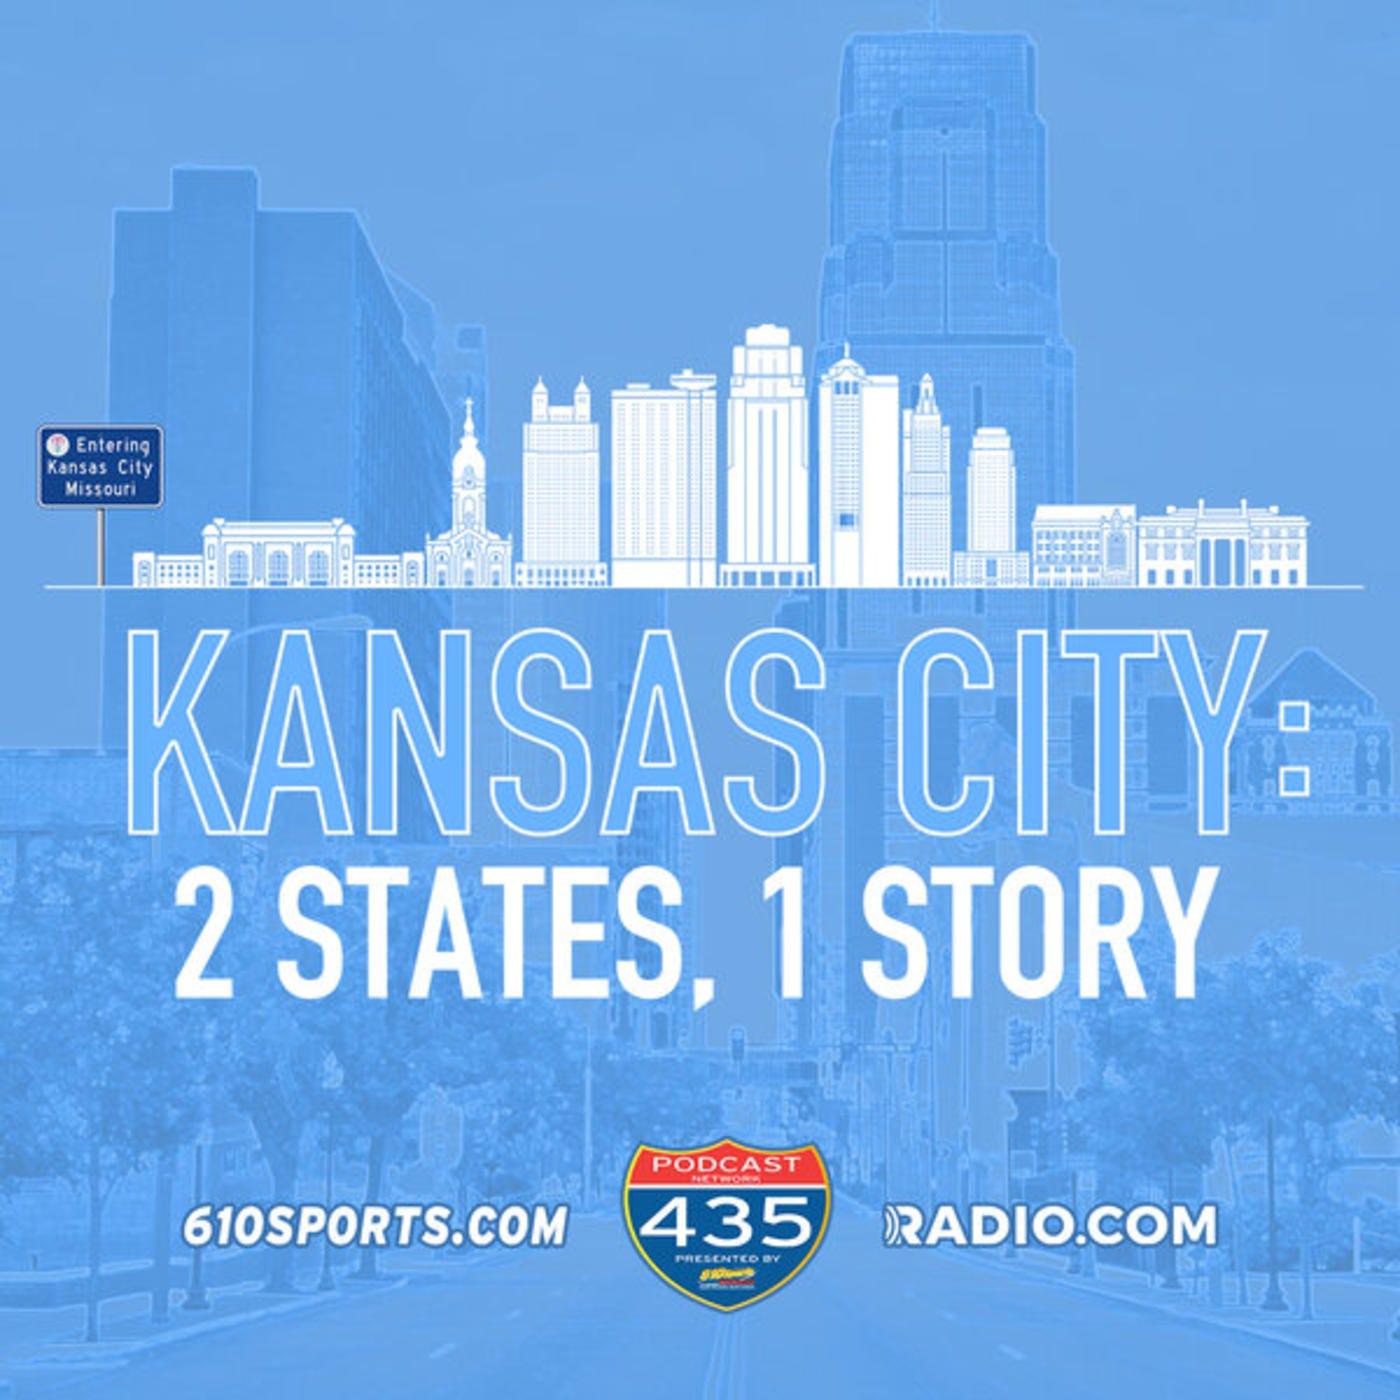 Kansas City:  2 States, 1 Story